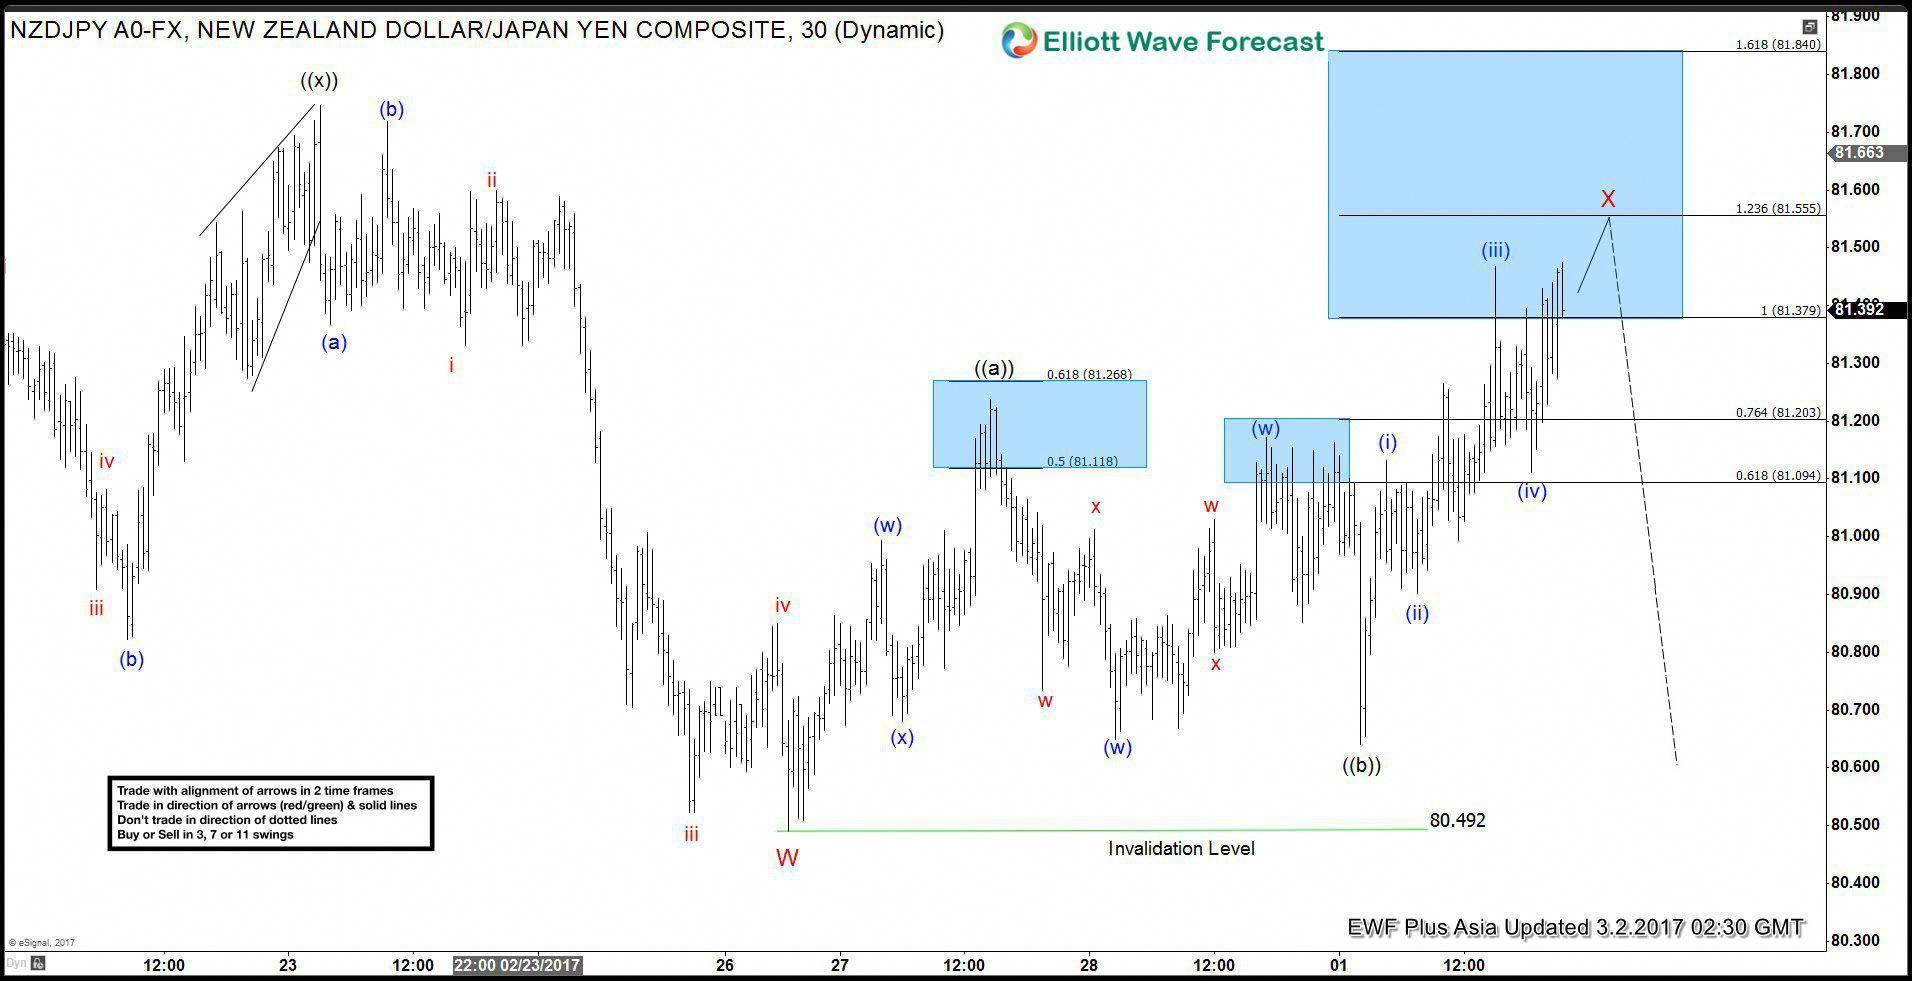 Check Your Elliott Wave Knowledge Trading Elliottwave Forex